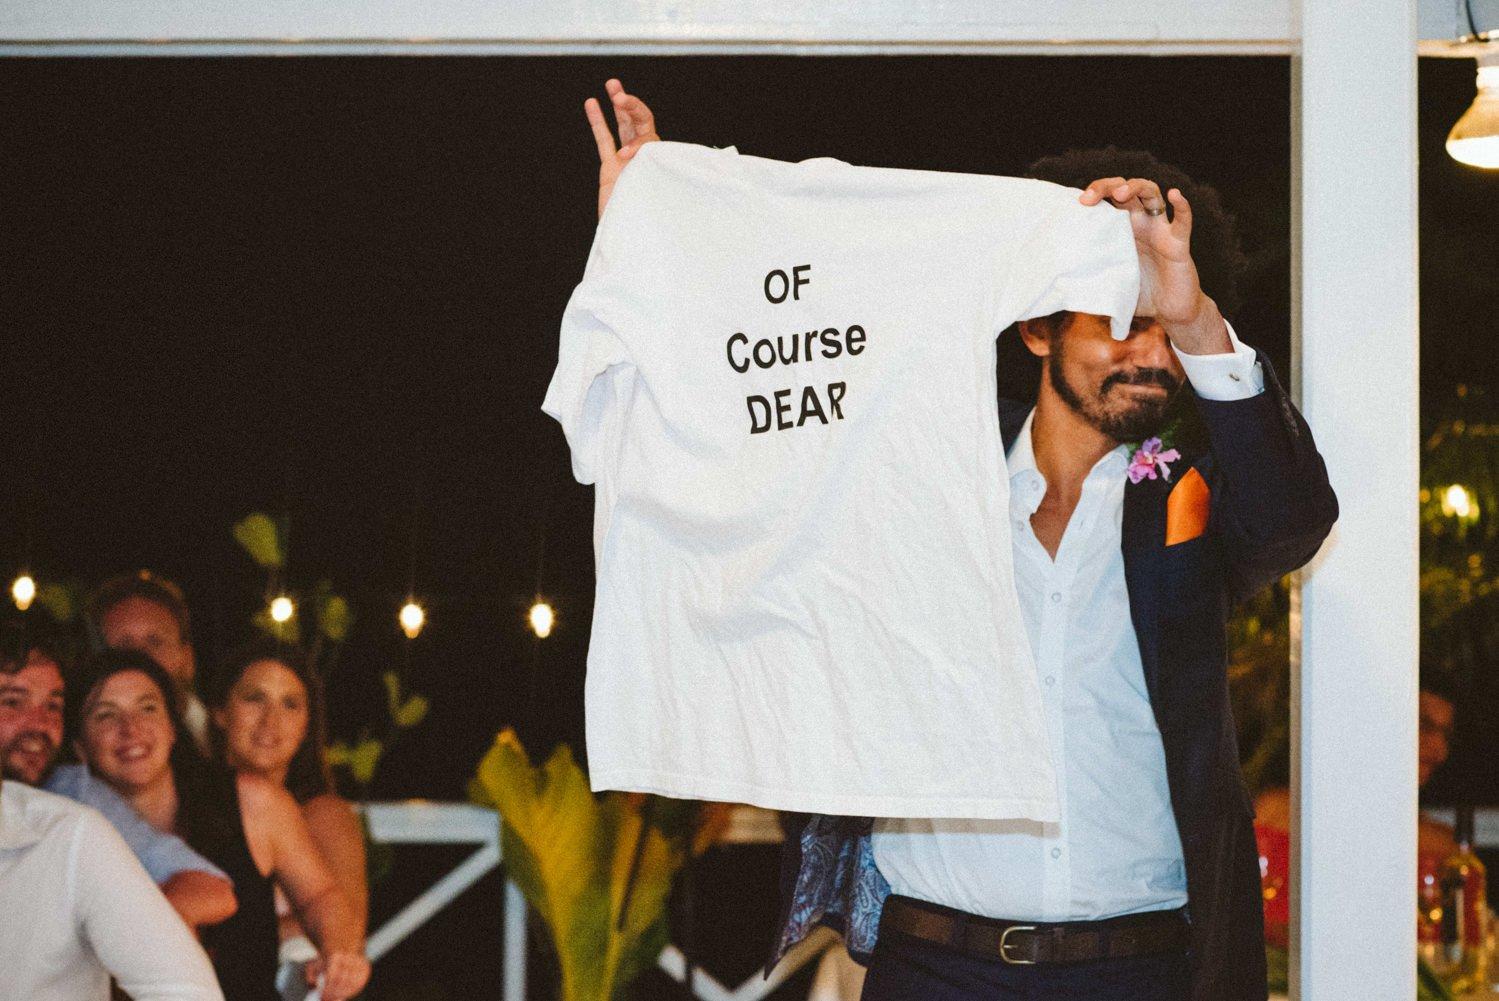 Of Course Dear T-shirt for groom Tobago wedding